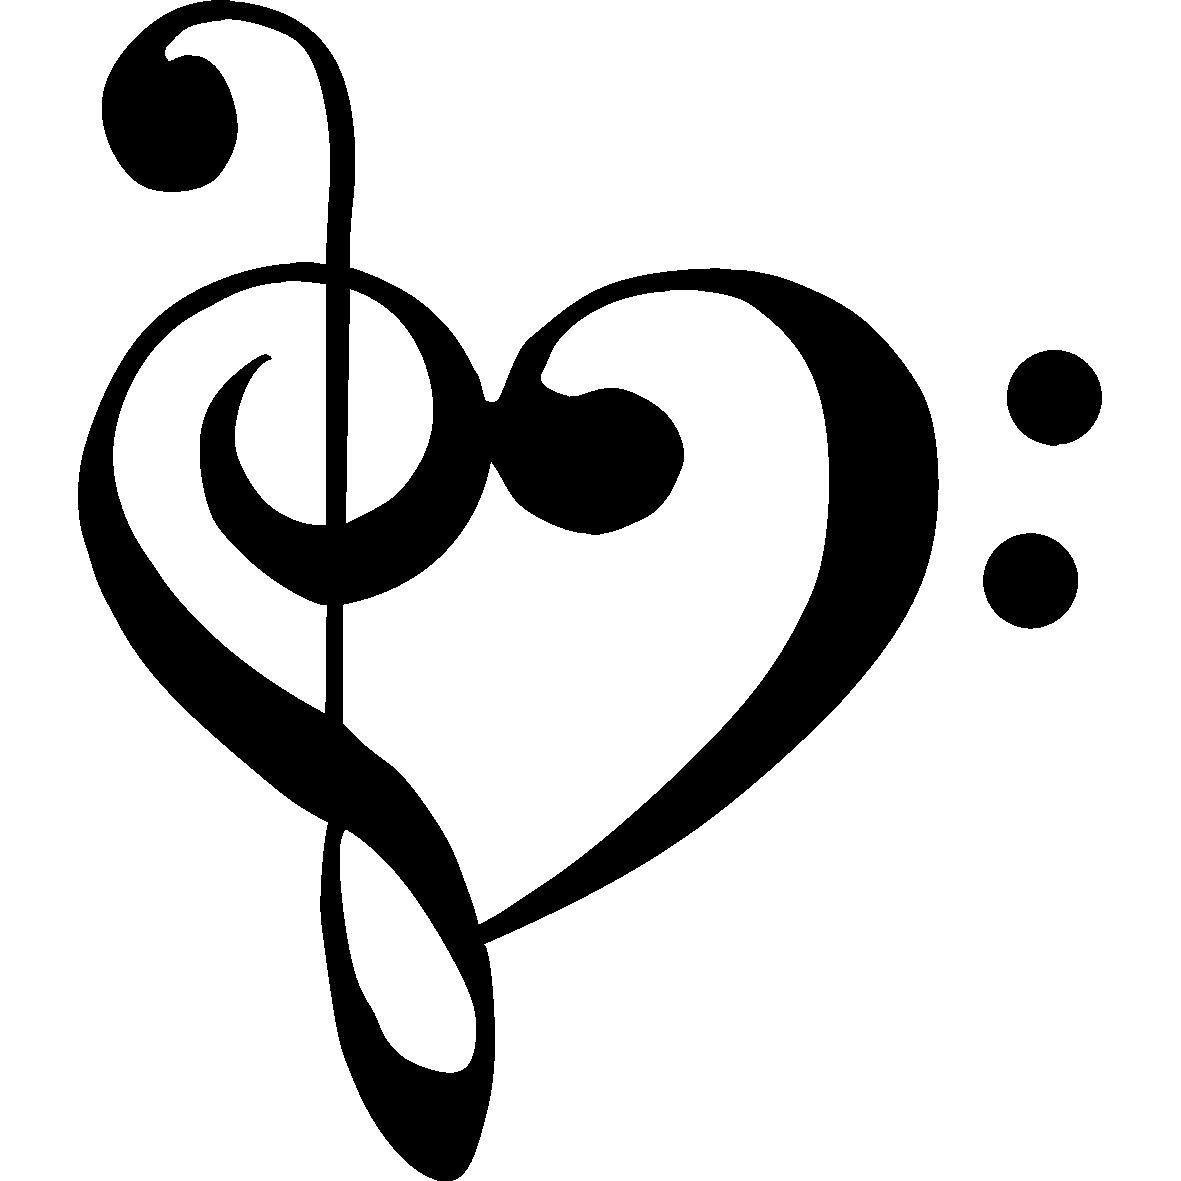 Nada Brahma Treble Clef Heart Music Note Heart Music Tattoos